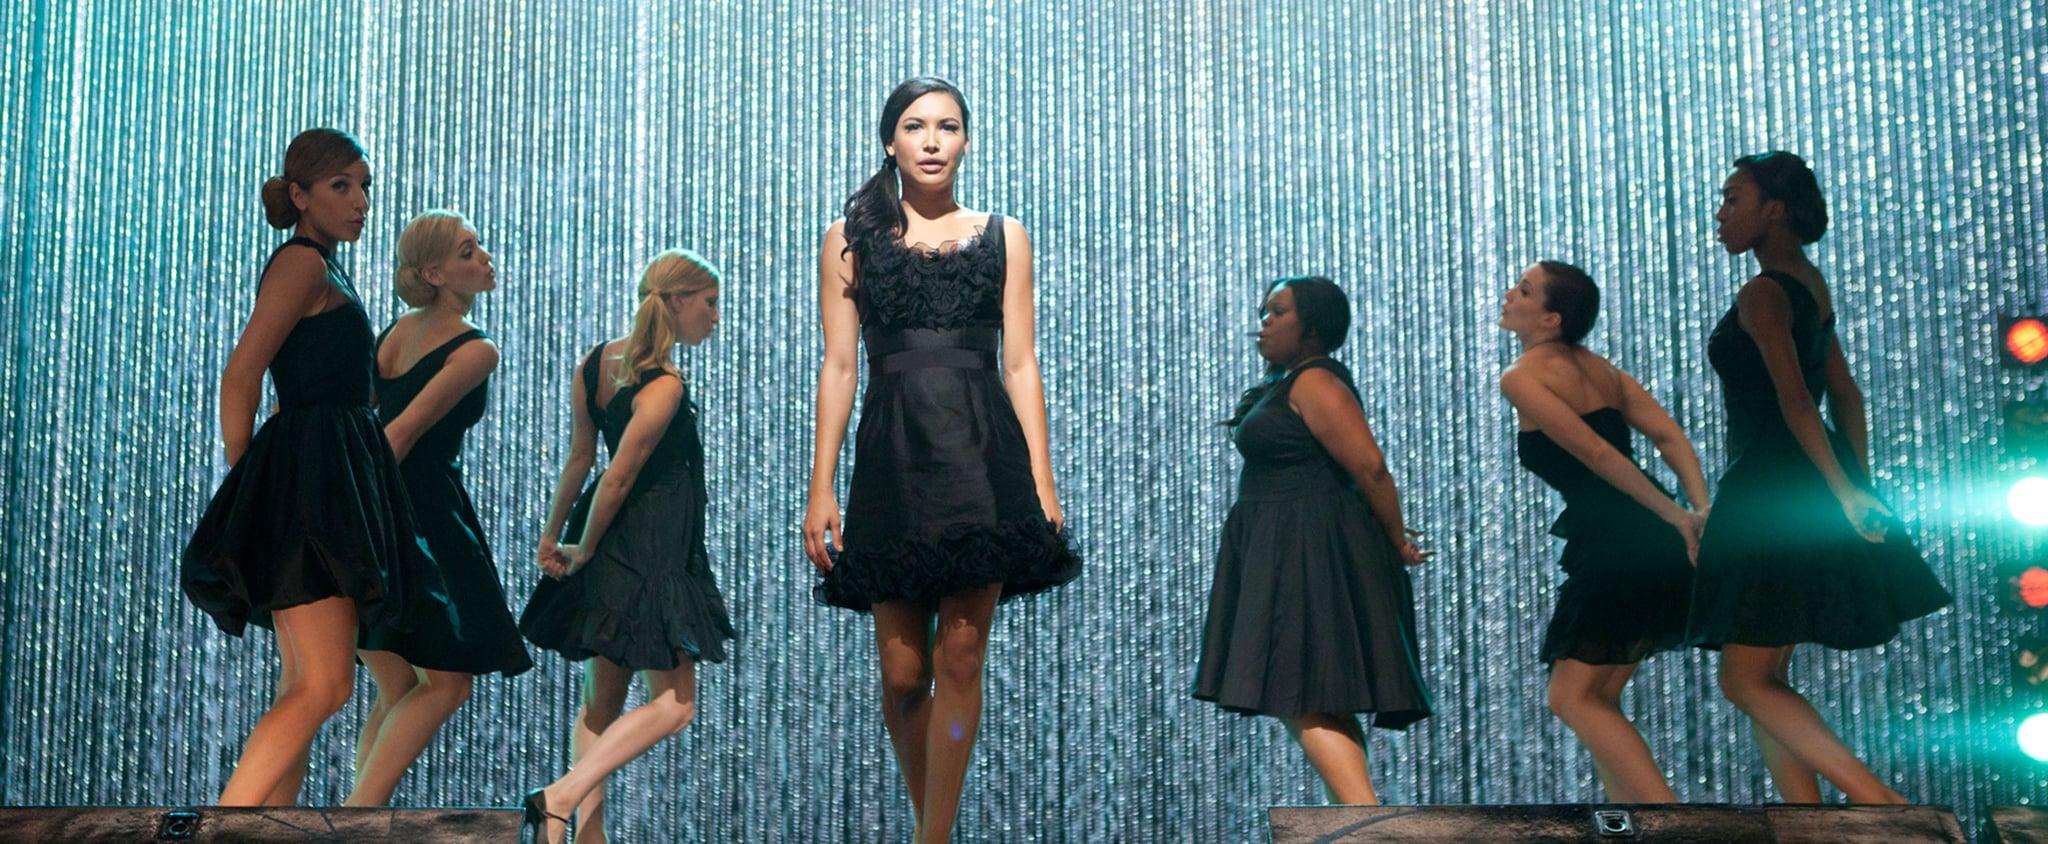 Watch 15 of Naya Rivera's Best Performances on Glee